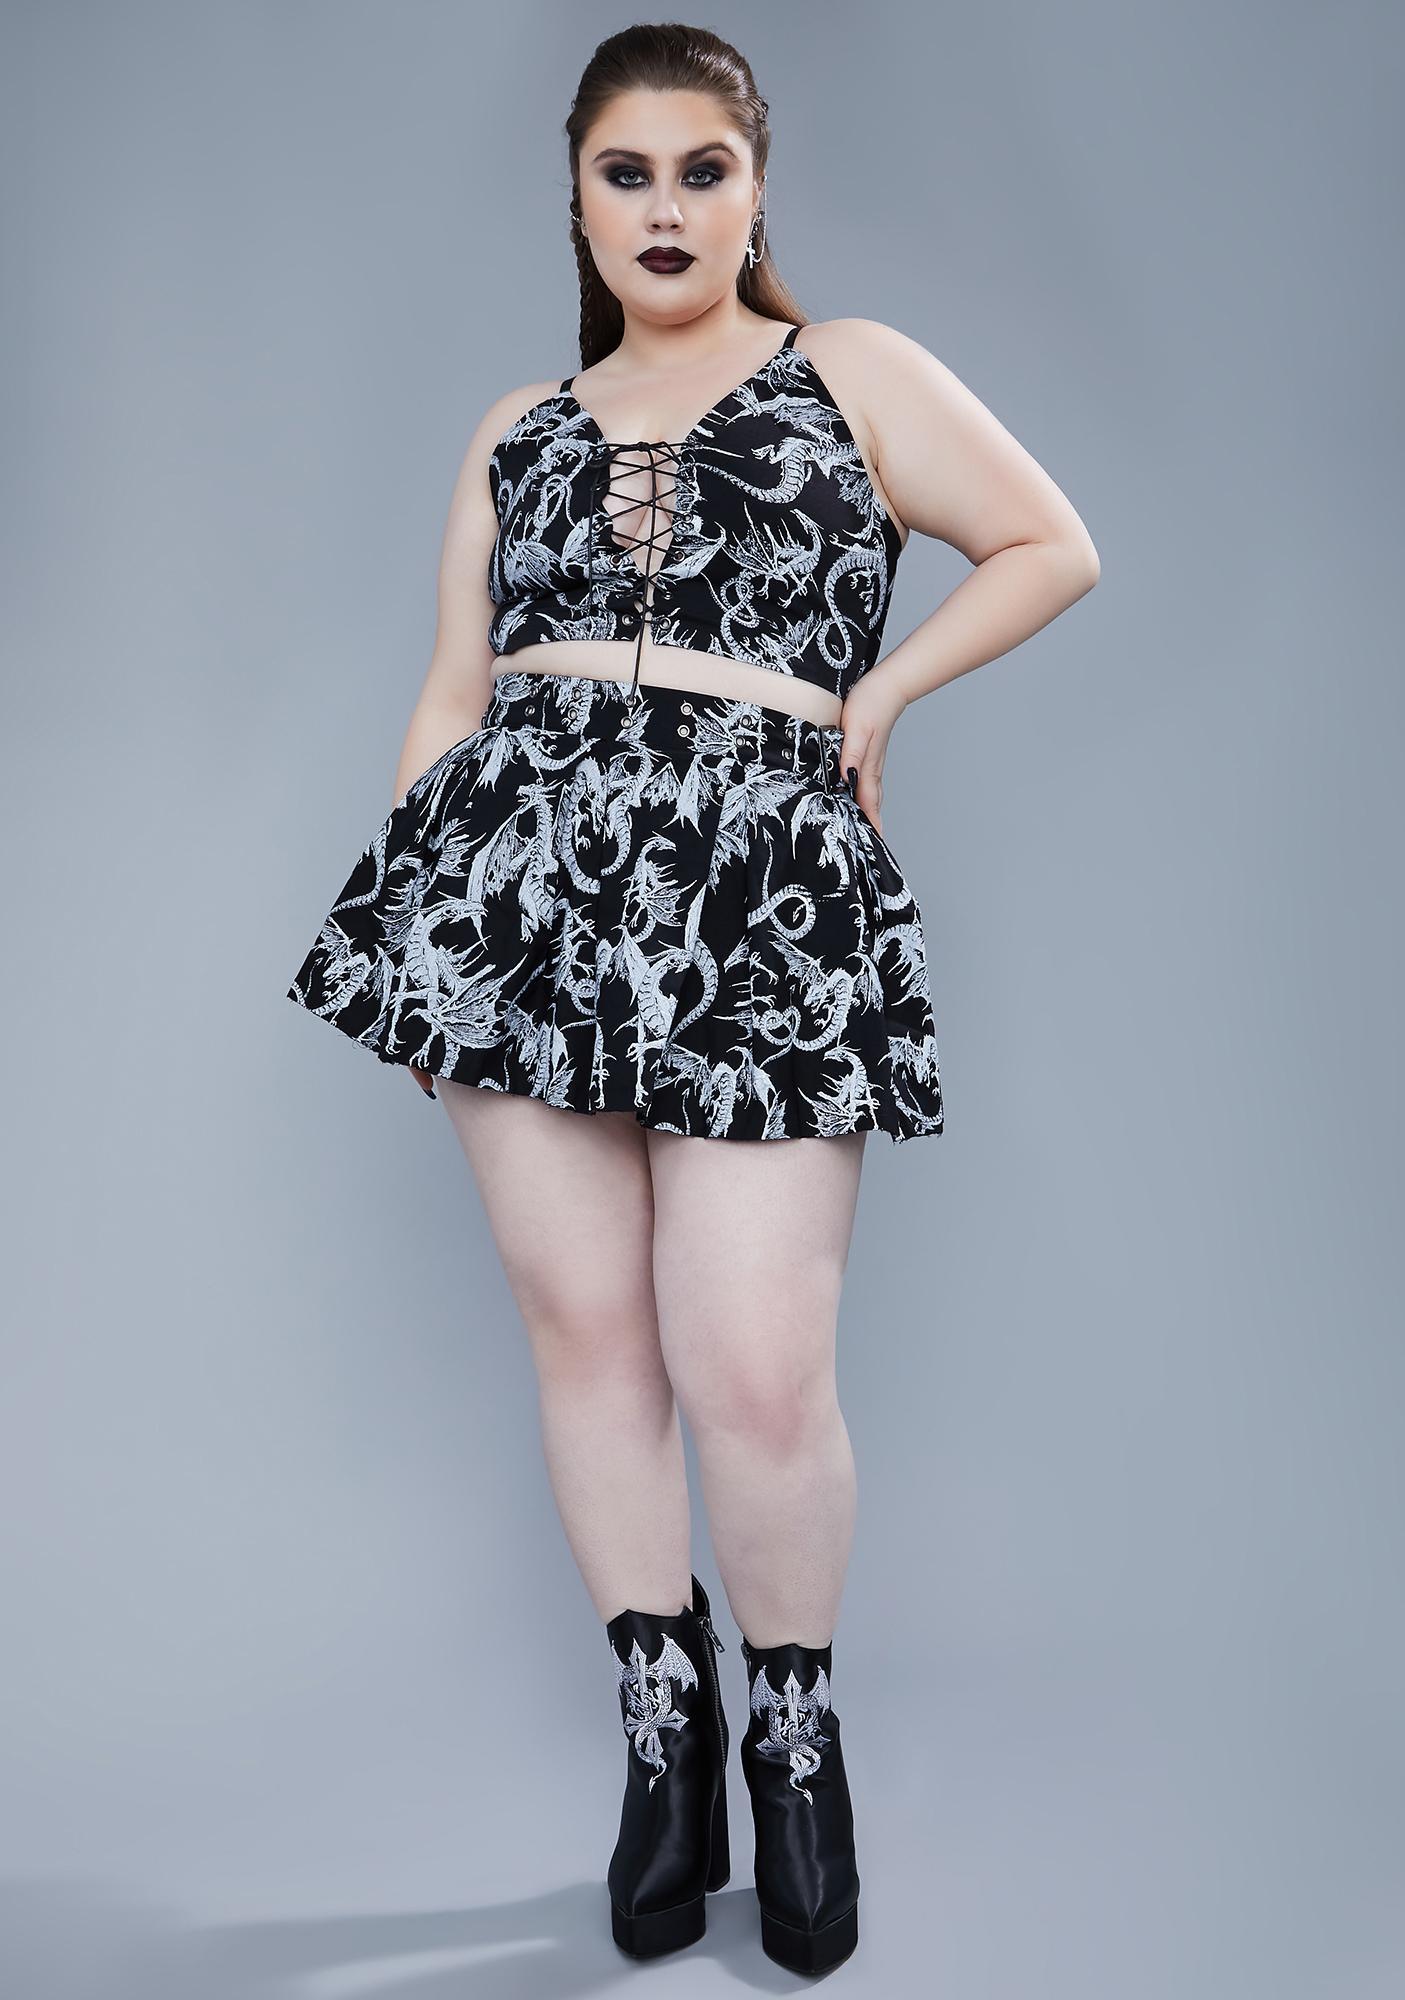 Widow There's A Certain Doom Skirt Set